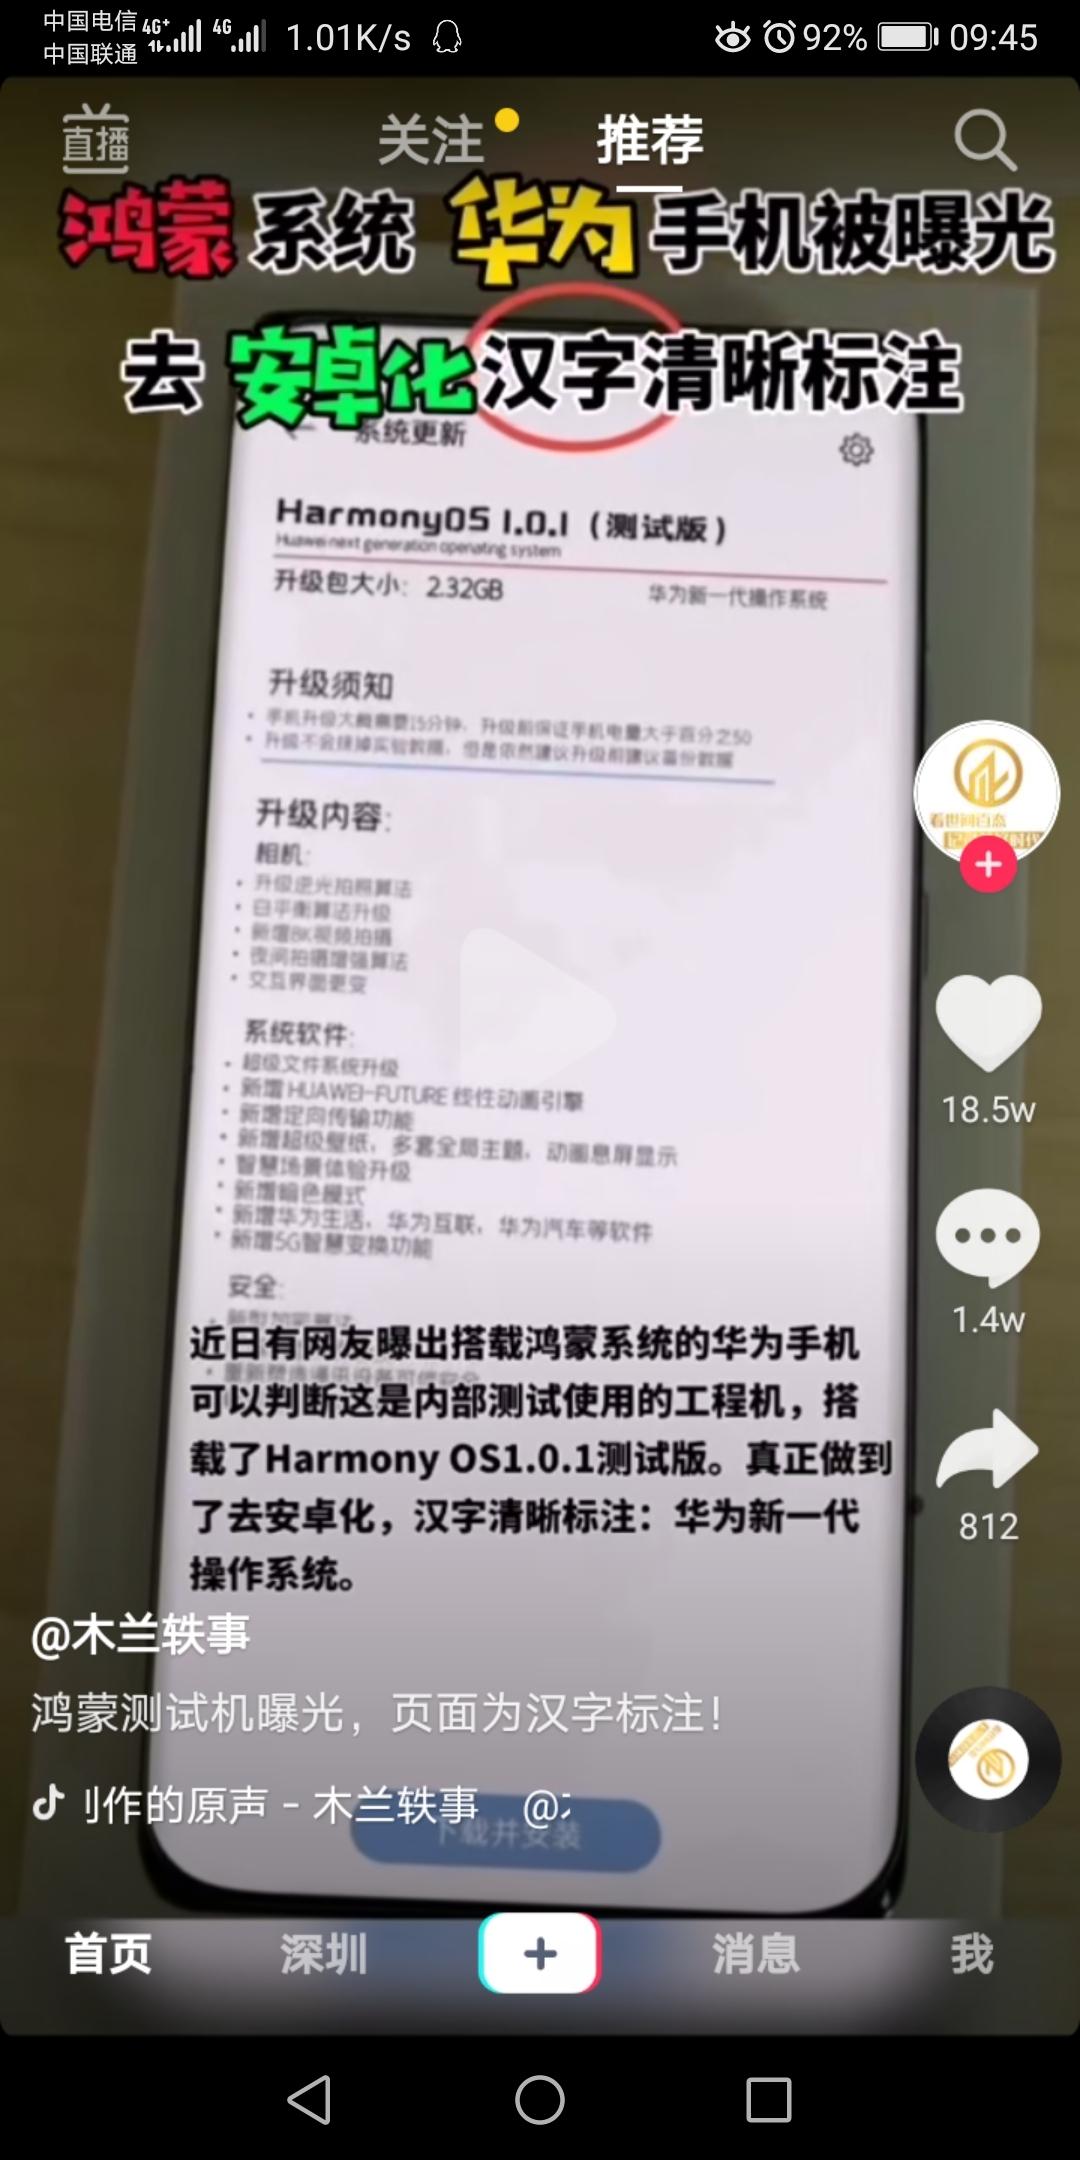 Screenshot_20200509_094515_com.ss.android.ugc.aweme.jpg